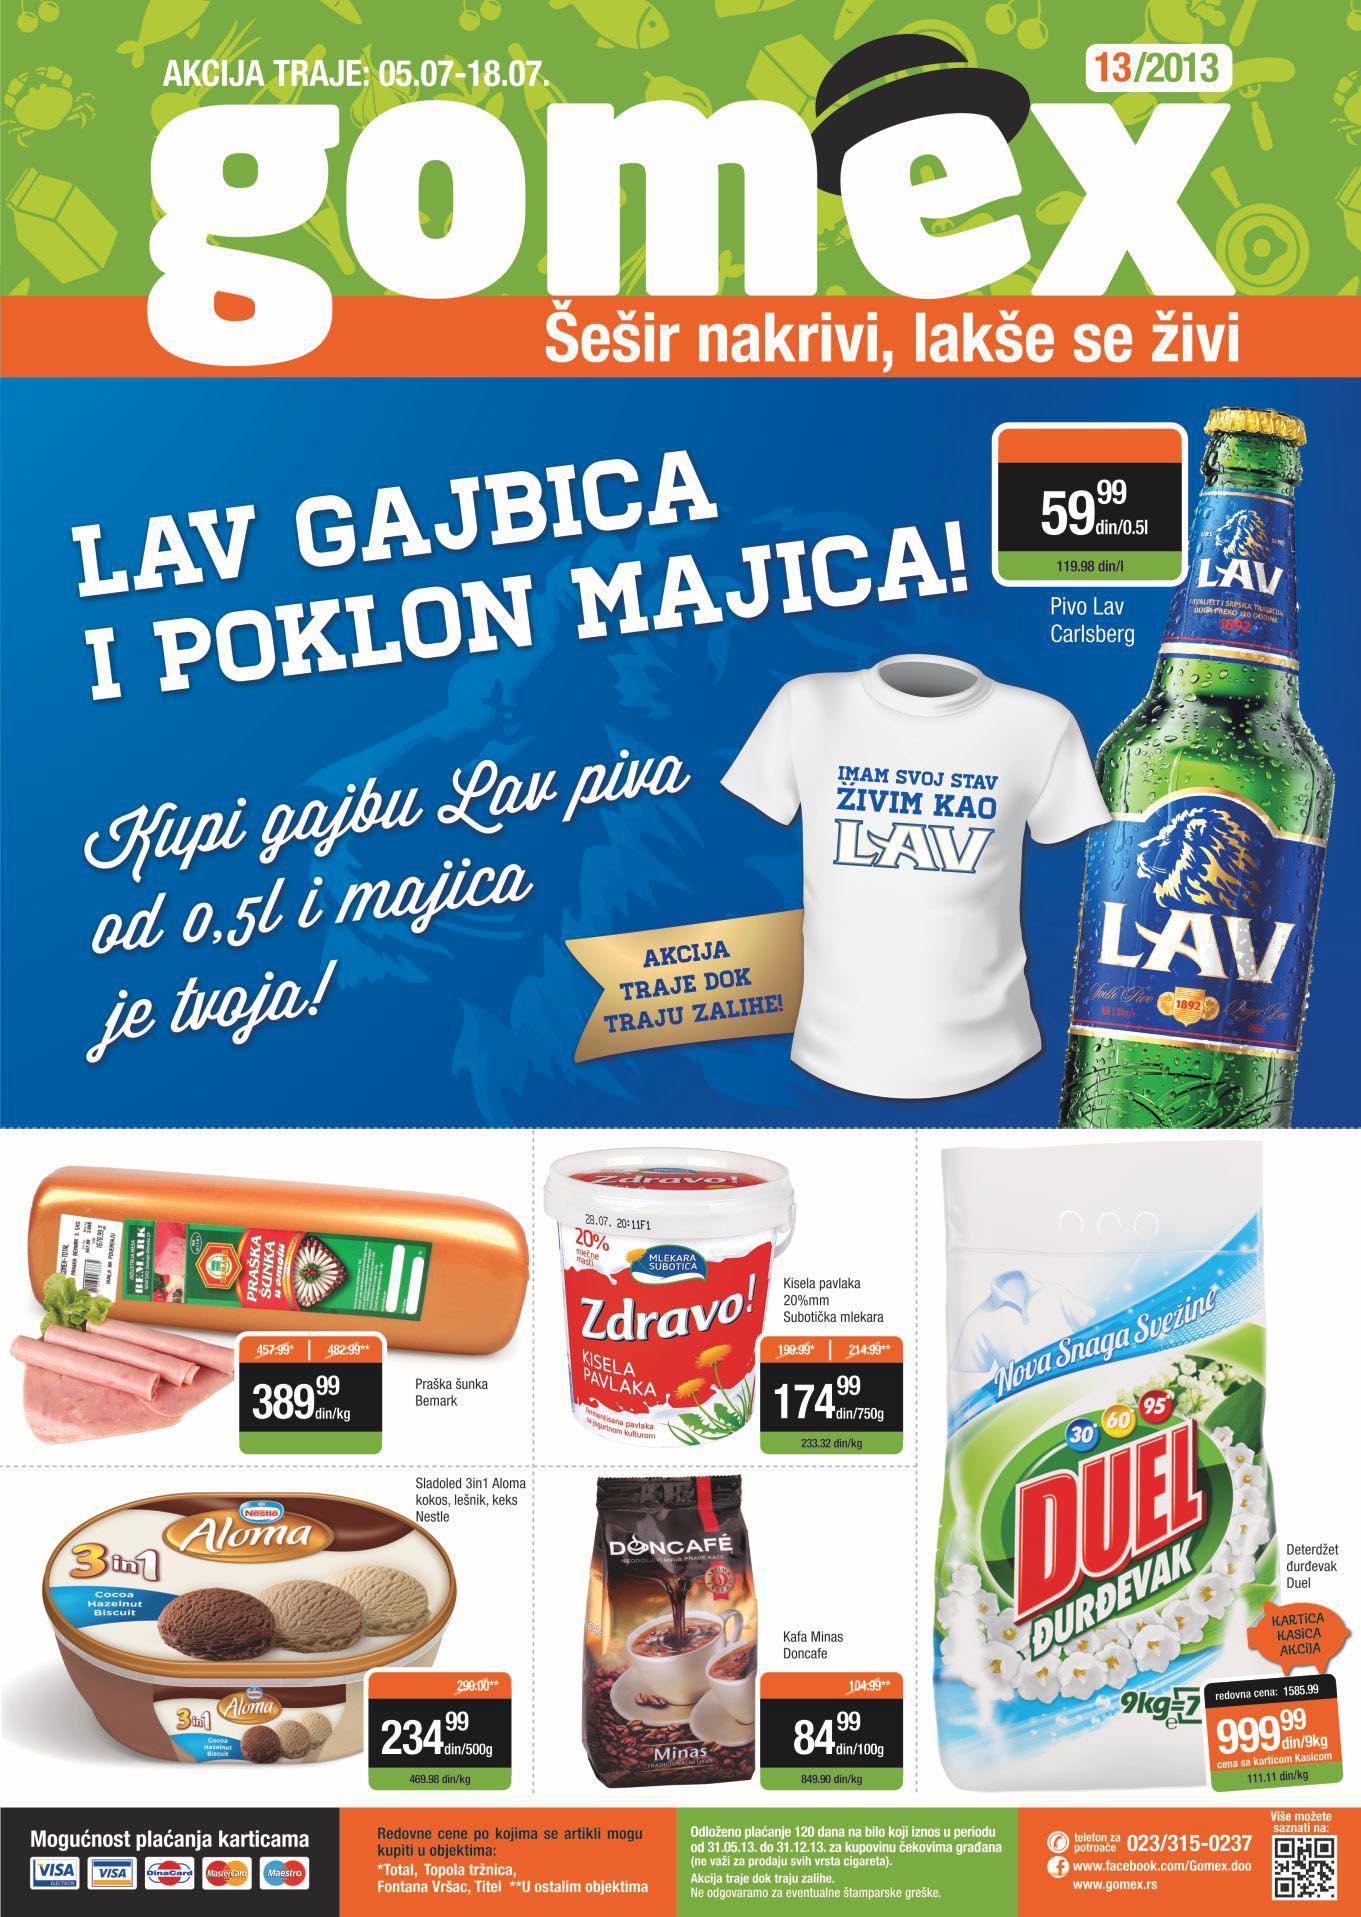 Gomex katalog dobre kupovine